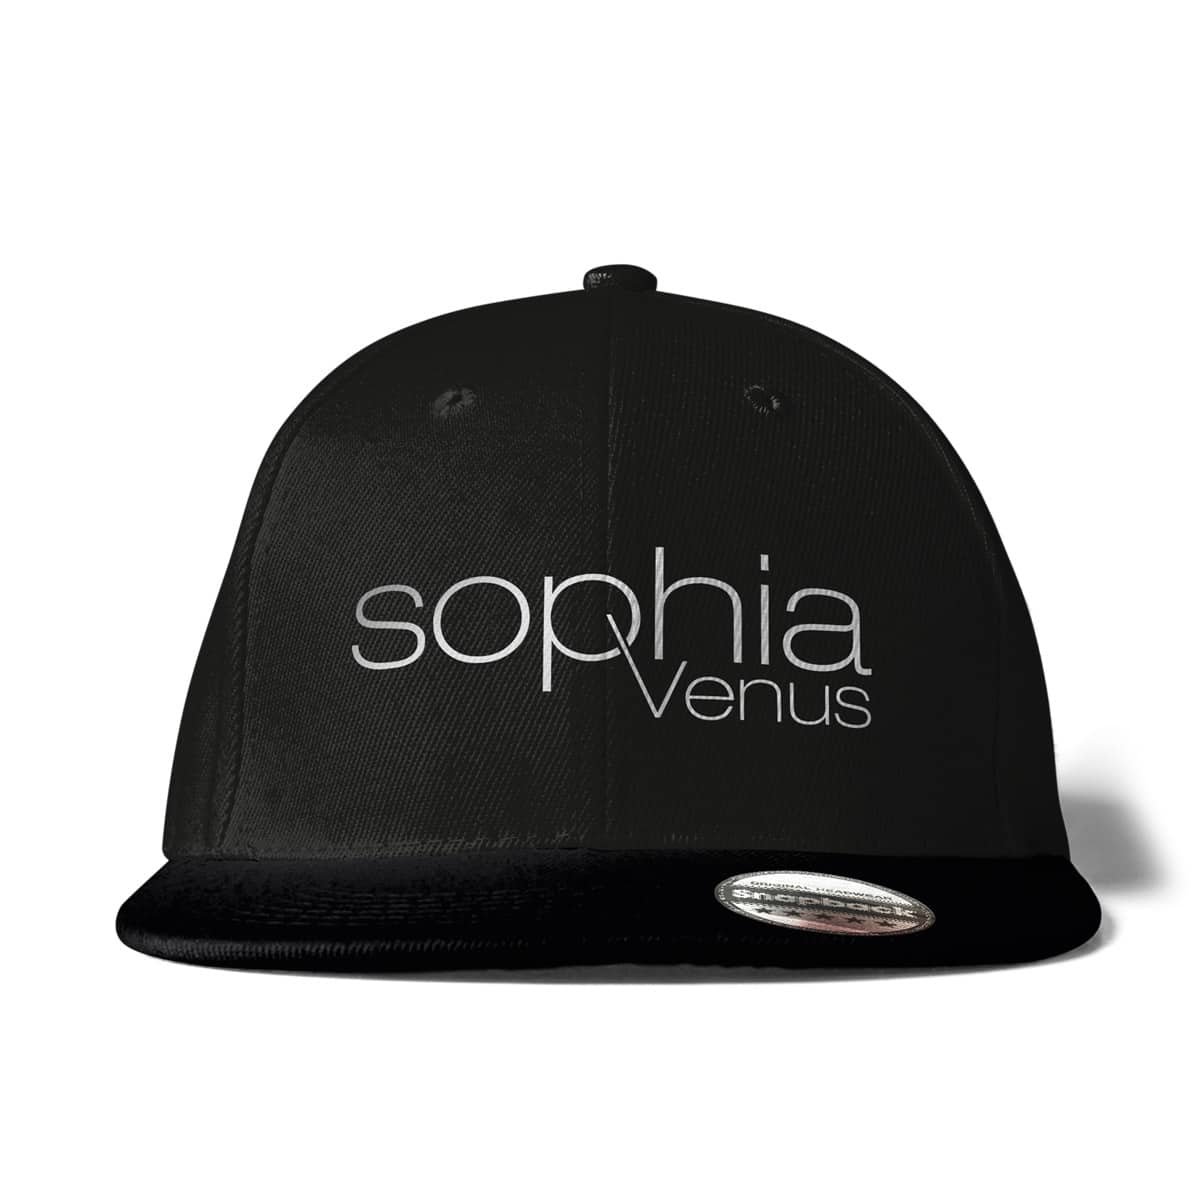 Cap Snapback Sophia Venus Schriftzug schwarz